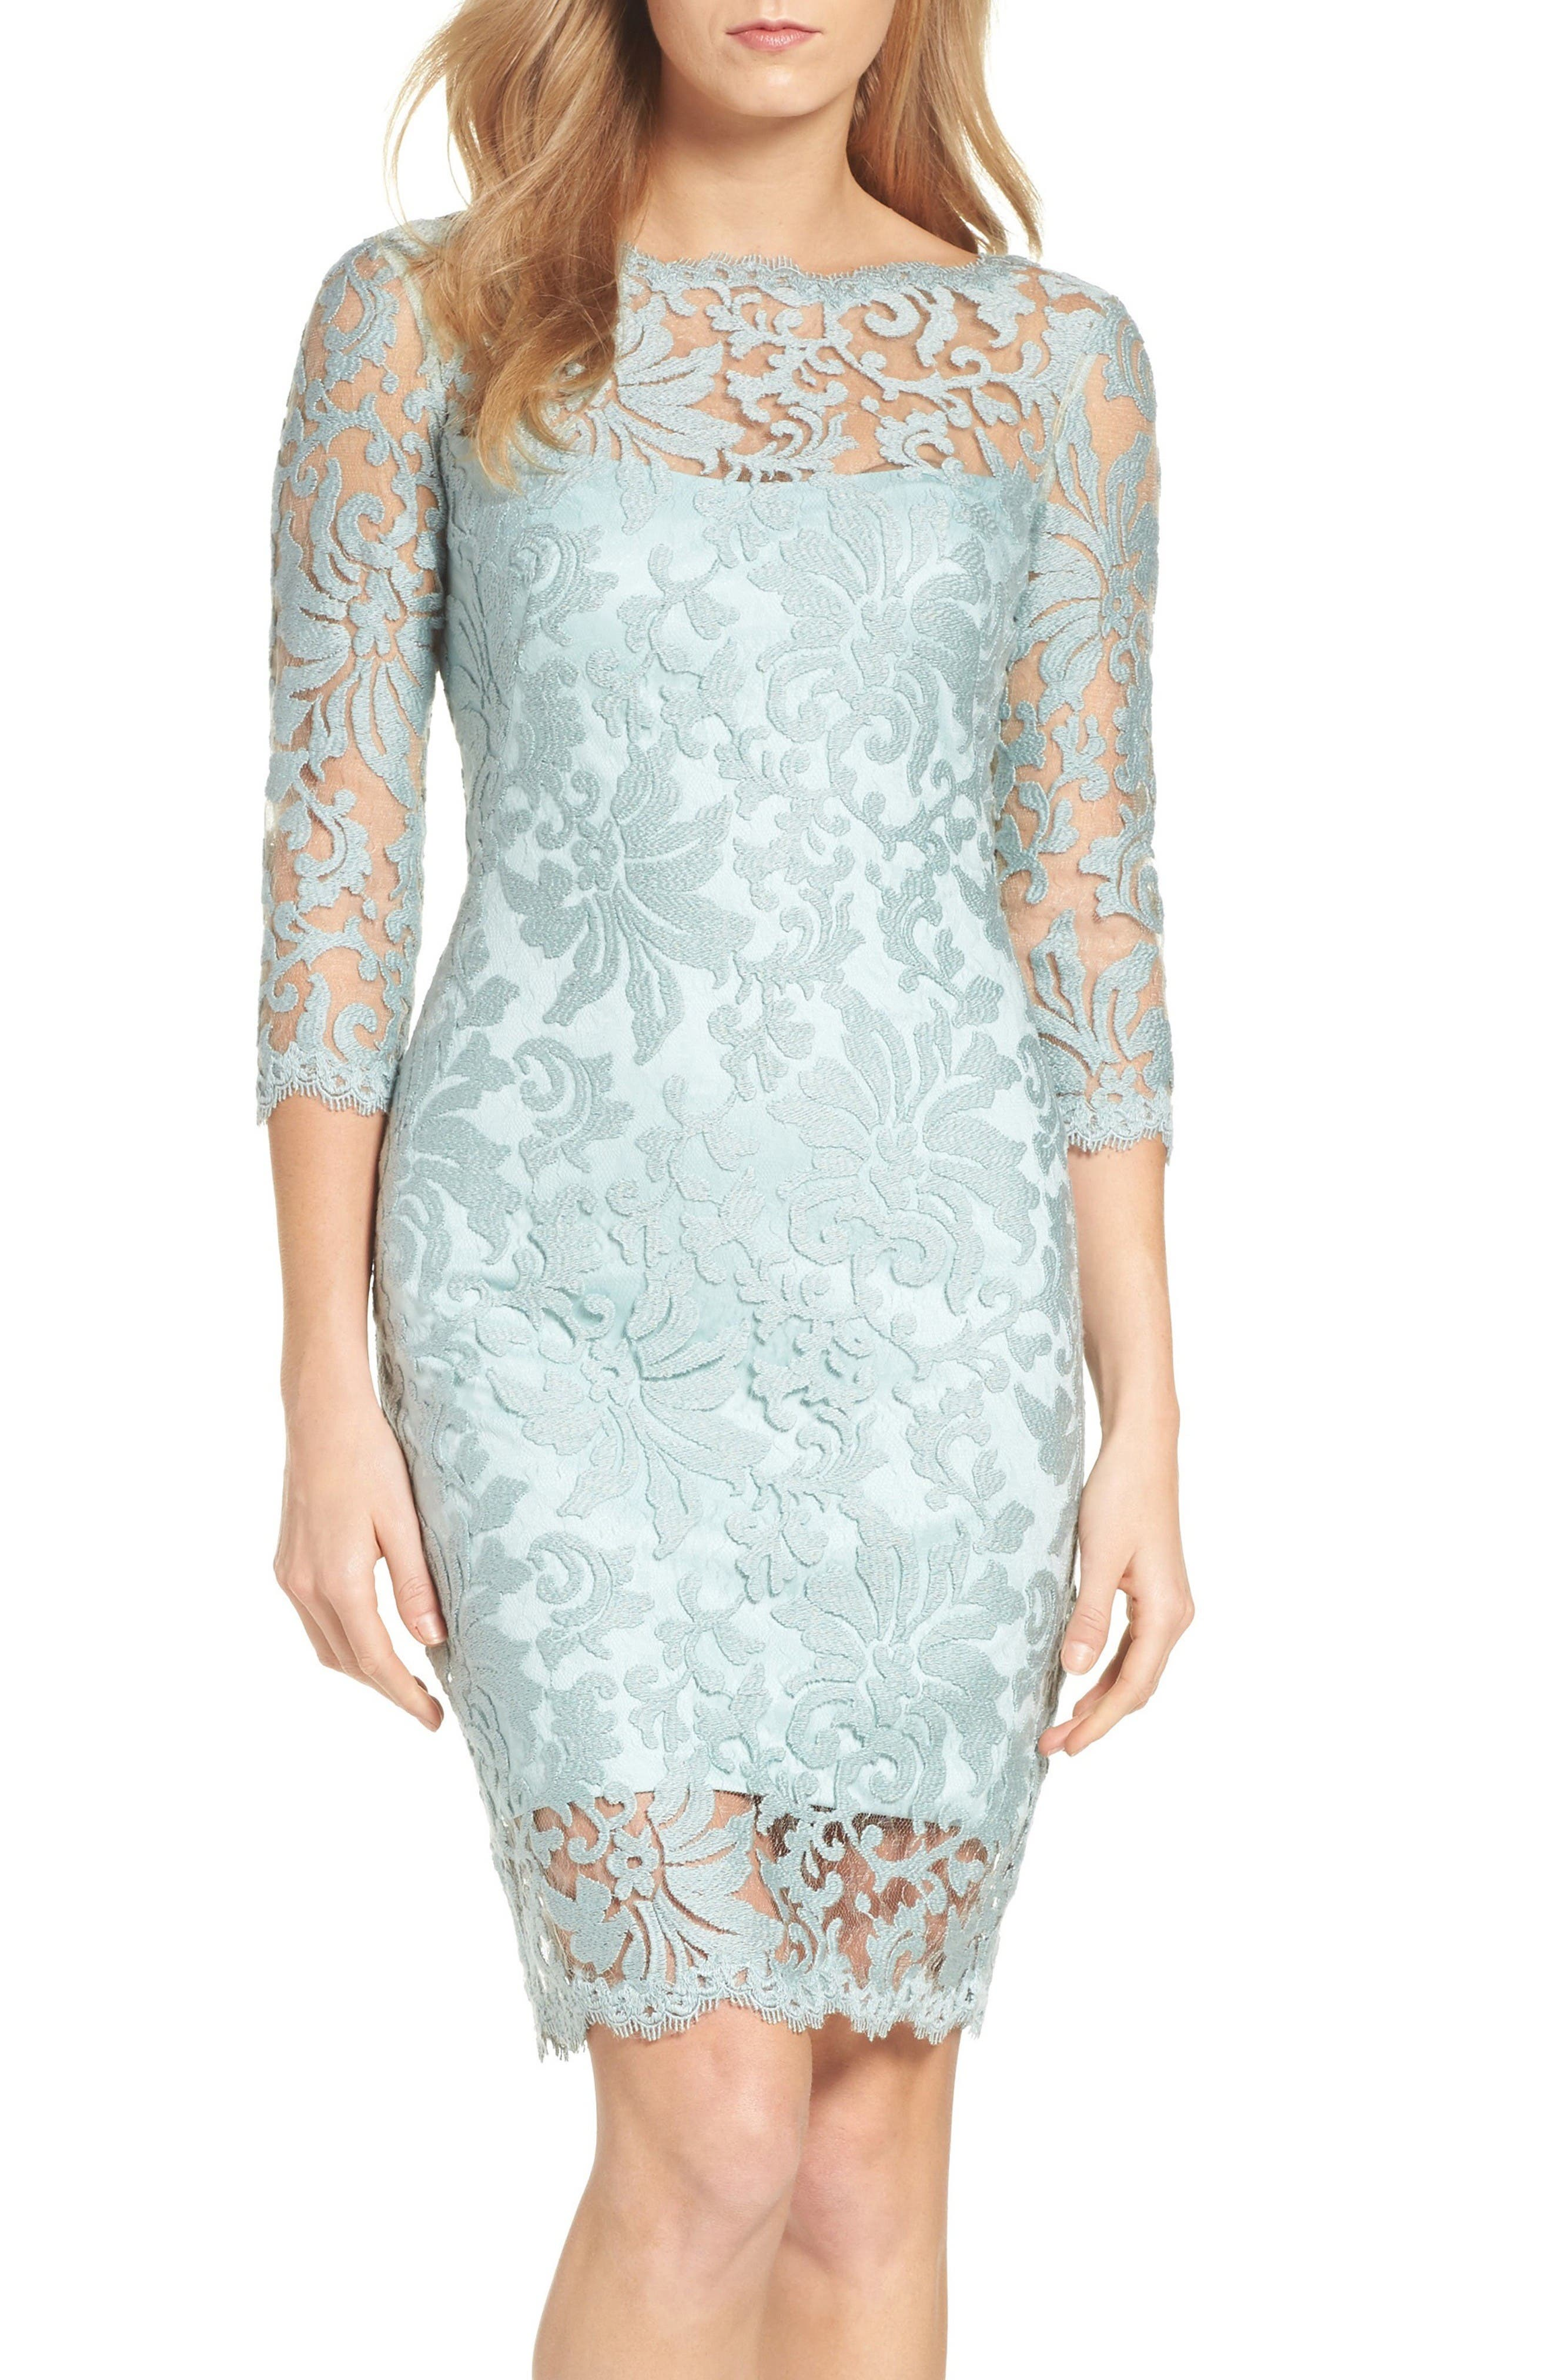 Alternate Image 1 Selected - Tadashi Shoji Embroidered Lace Sheath Dress